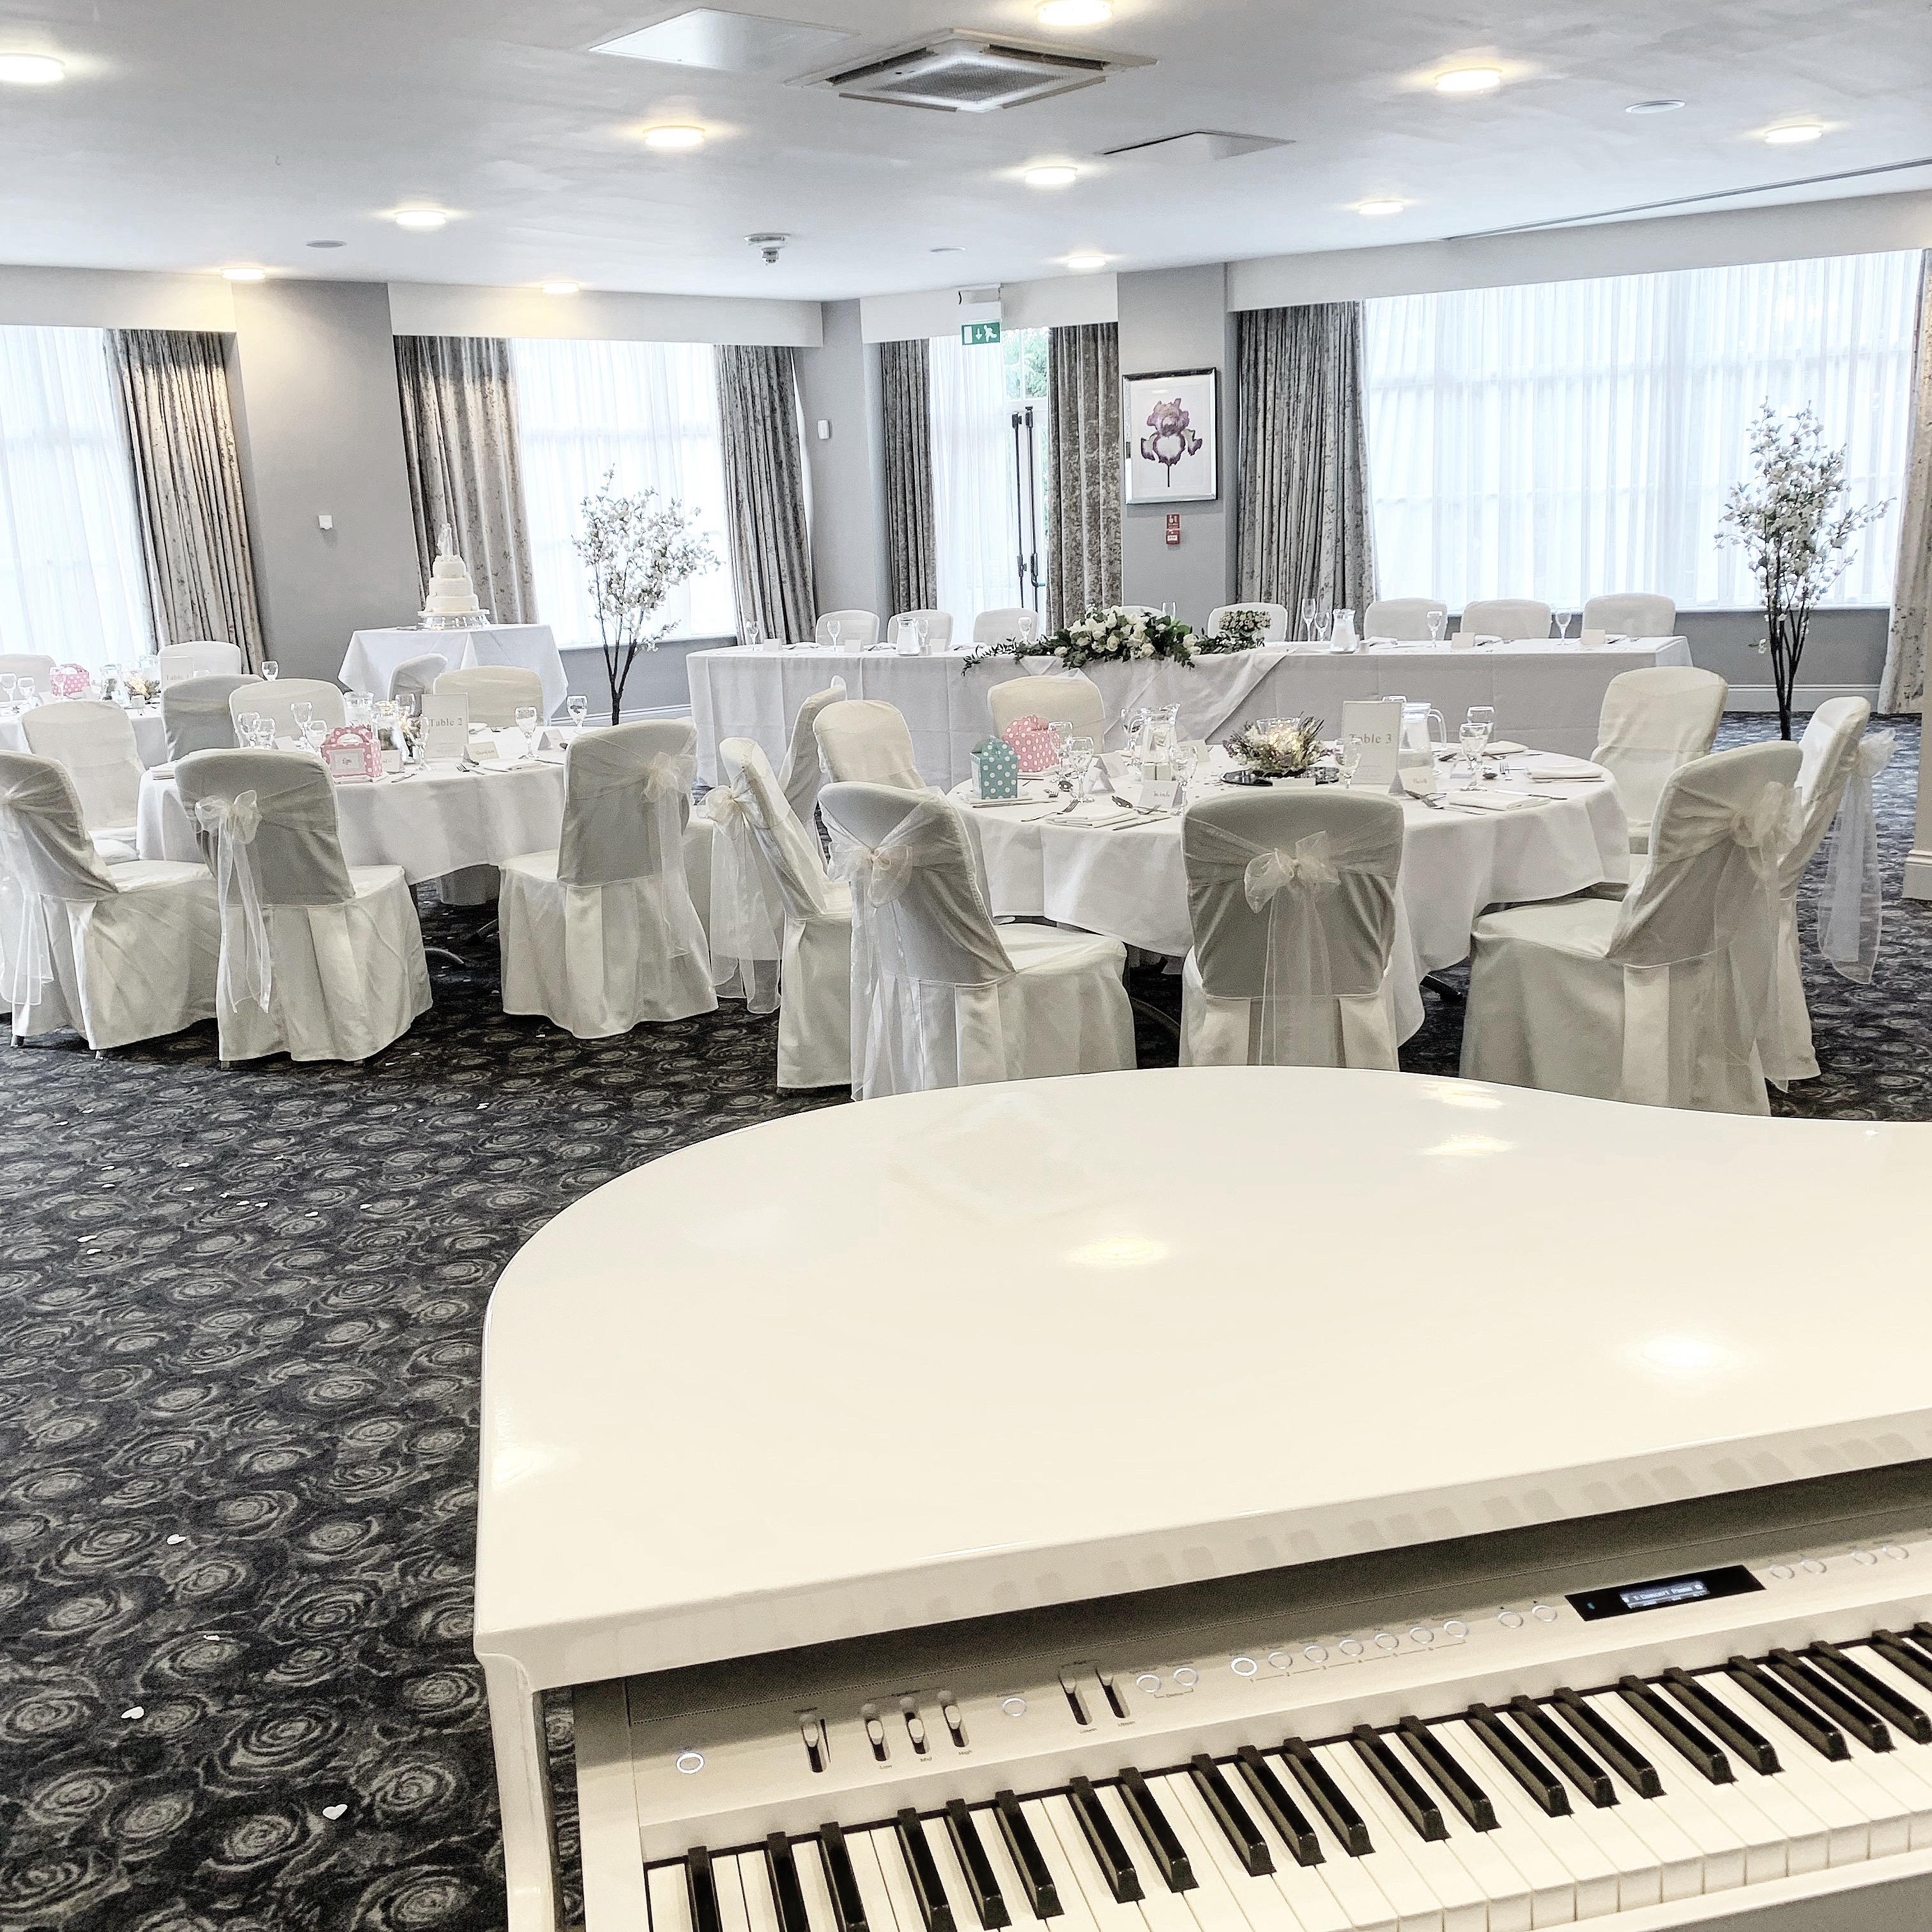 Craig Smith pianist for Ribby Hall weddings